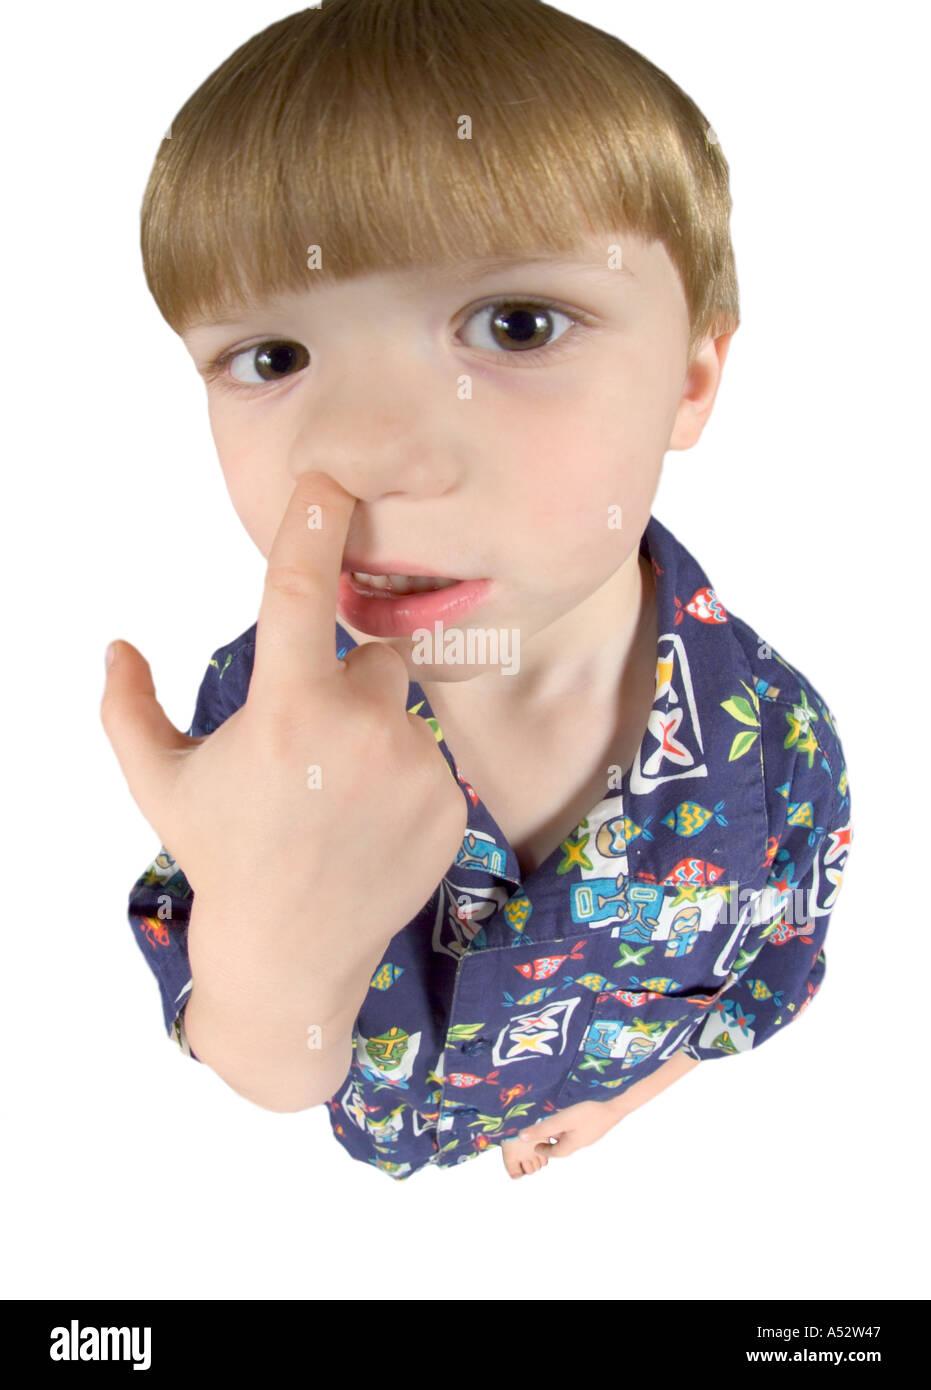 Junge Witzig Humor Dumme Perspektive Kind Kinder Gesicht Gesichter